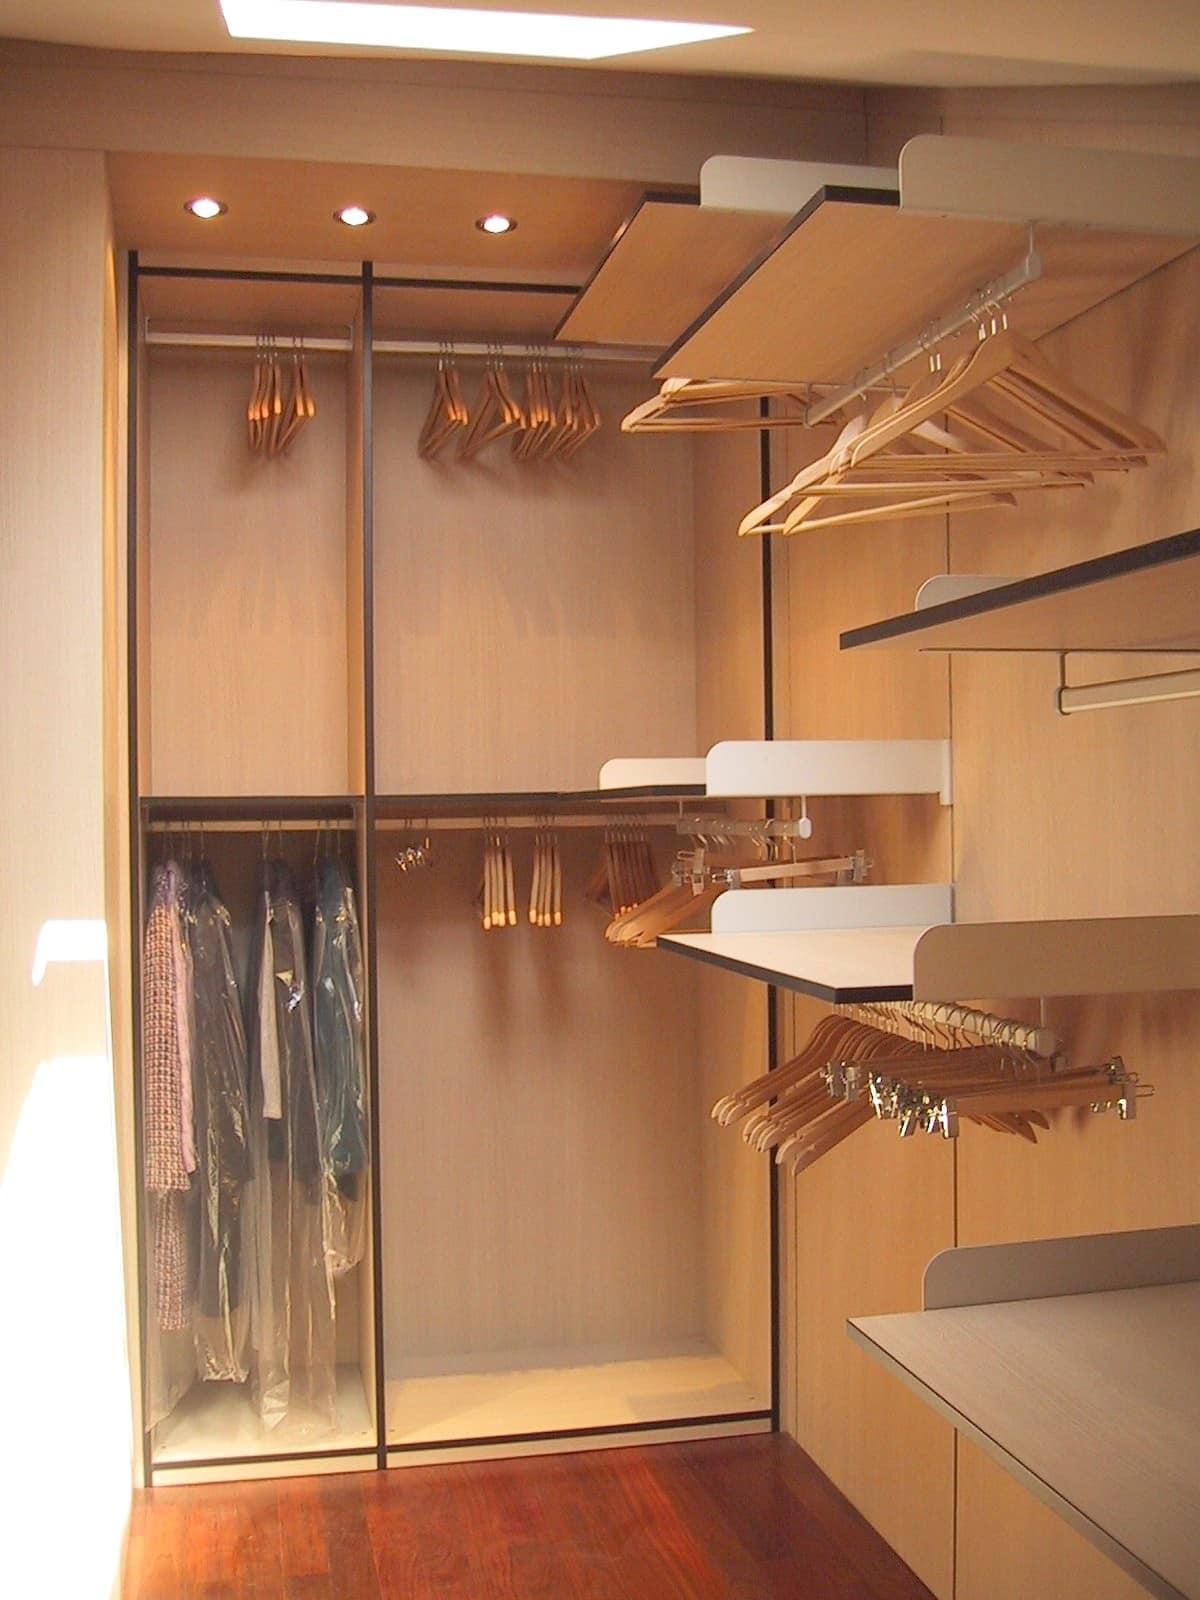 Cabina armadio dimensioni cabina armadio novamobili wing